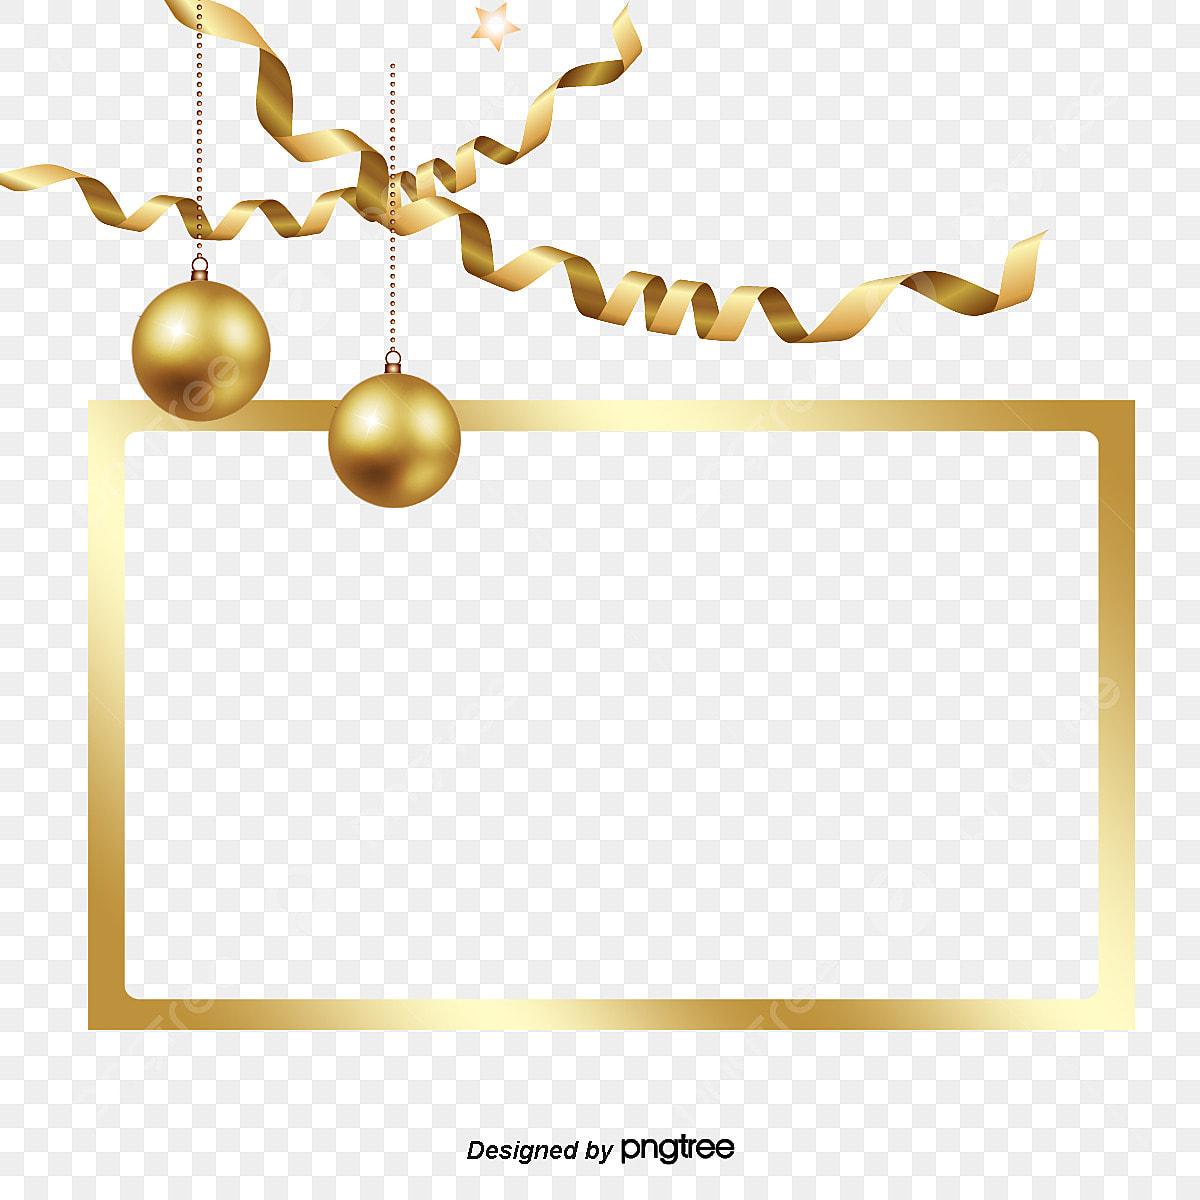 Christmas Chain Clipart.Golden Christmas Decoration Star Ribbon Border Bright